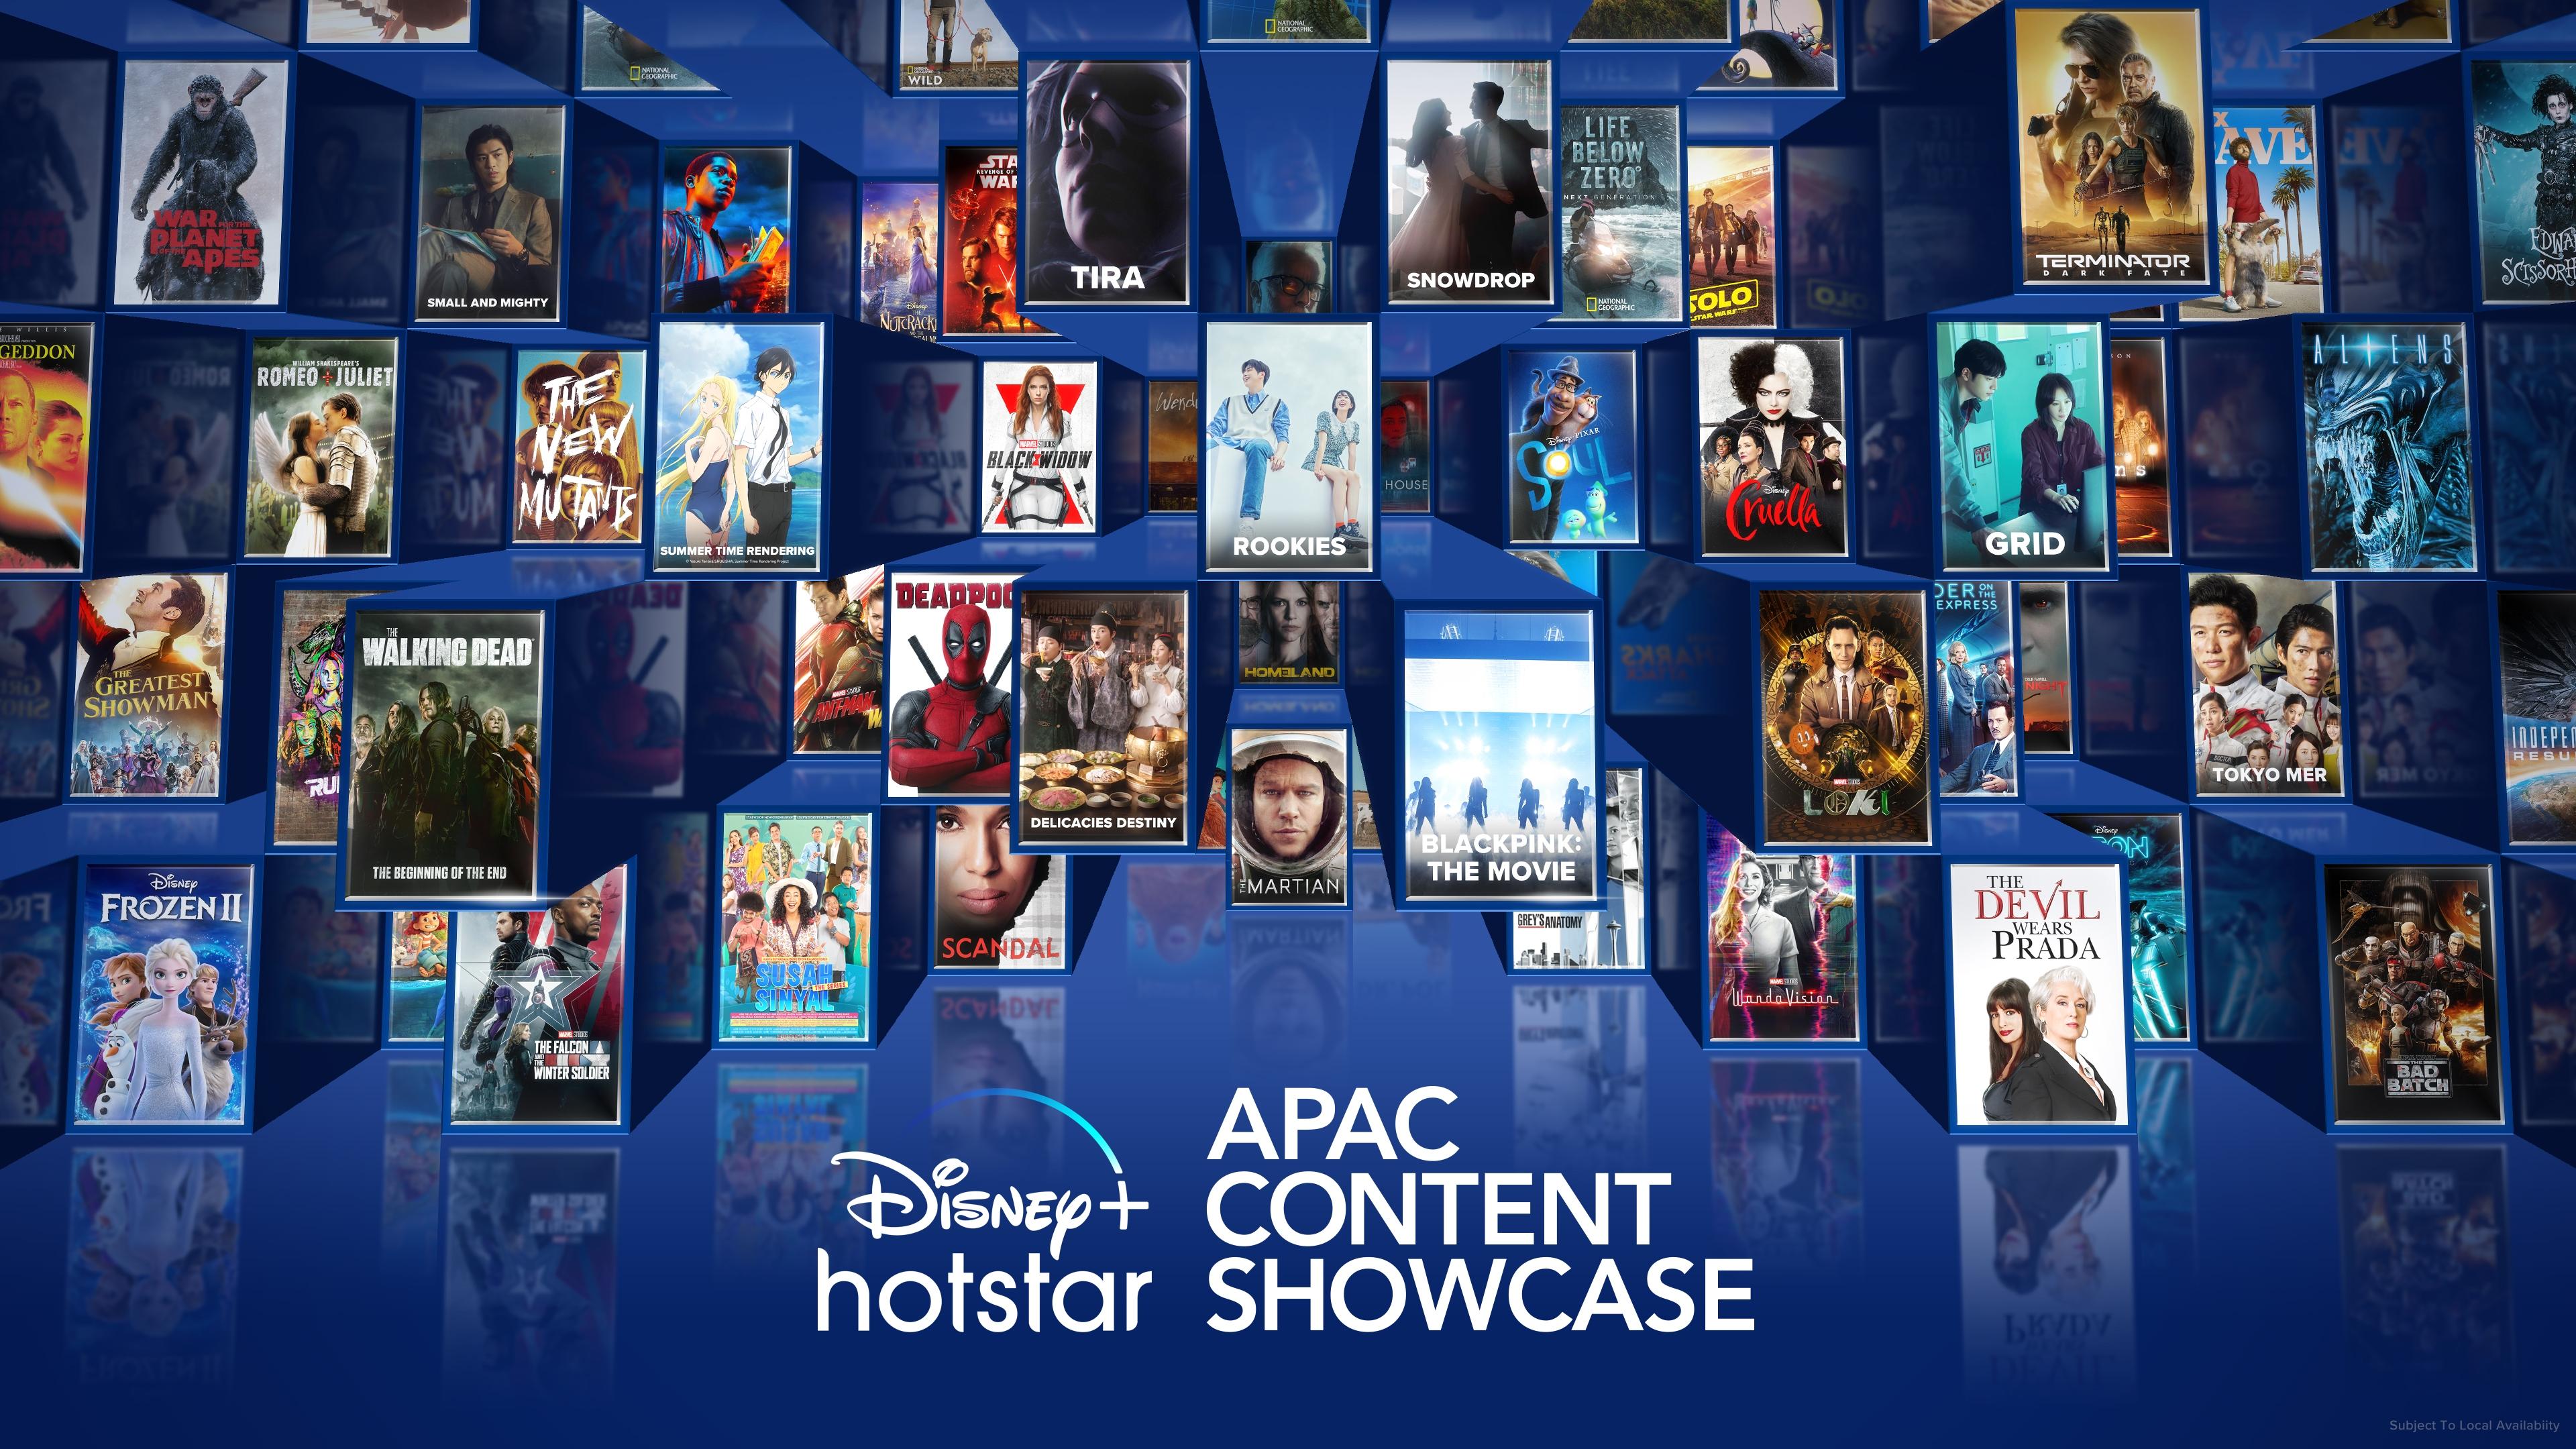 Disney+ APAC Showcase